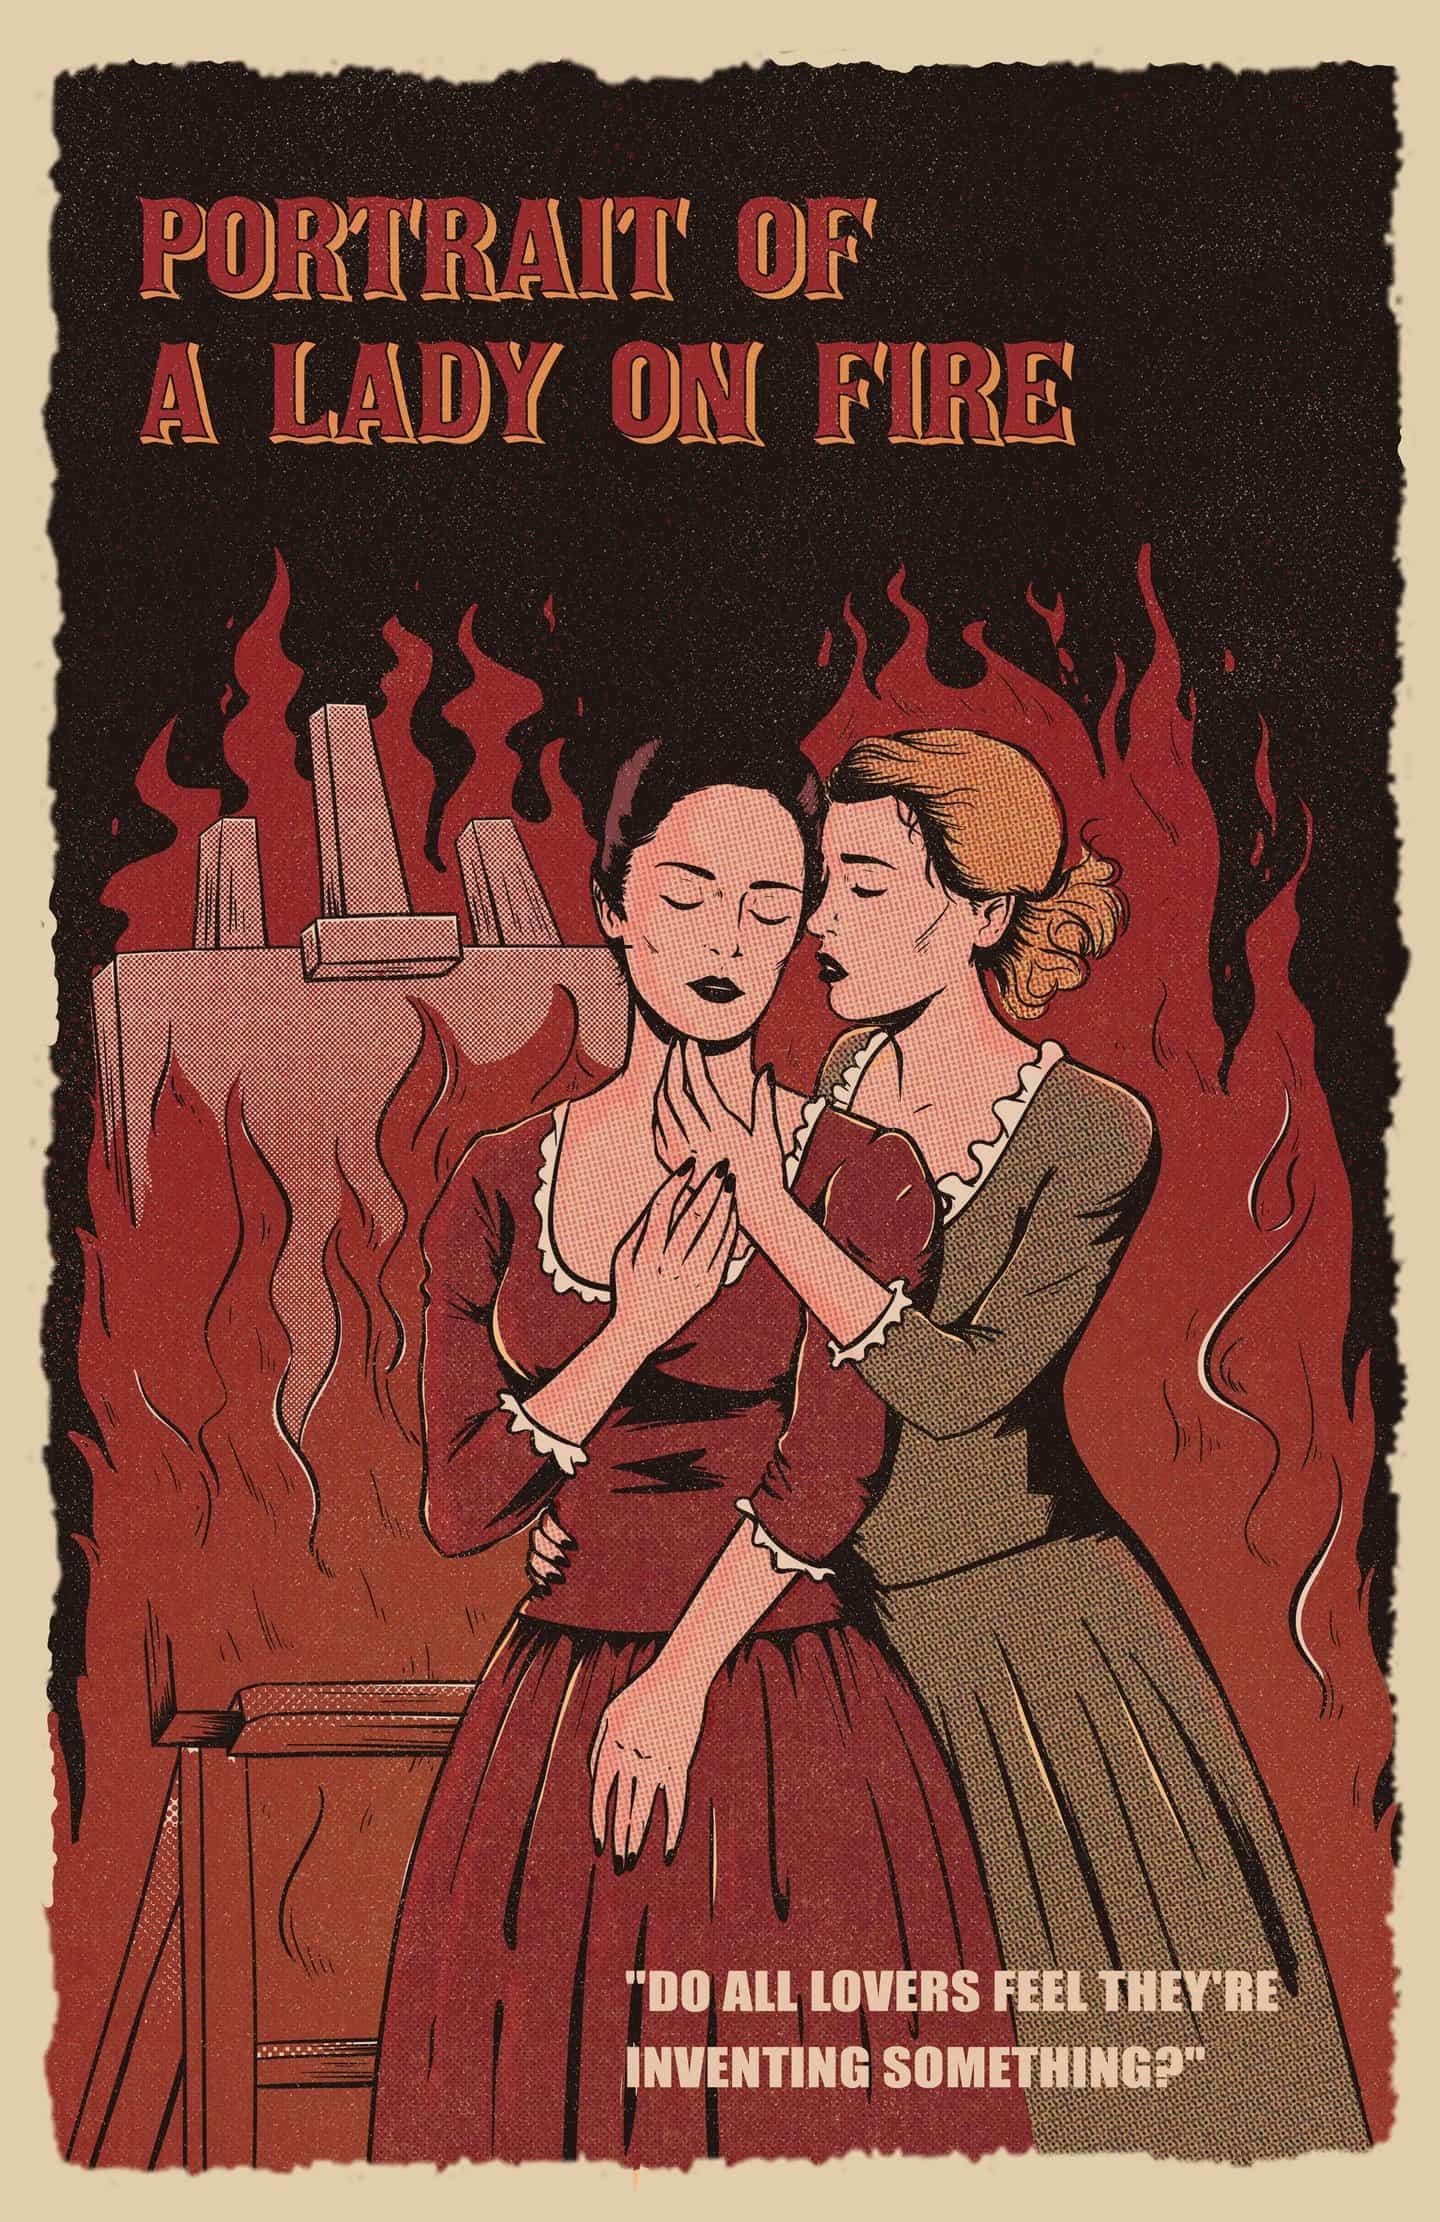 Jenifer Prince: Lesbian Pulp Movie Posters - Retrato de una dama en llamas (Copyright © Jenifer Prince, 2020)